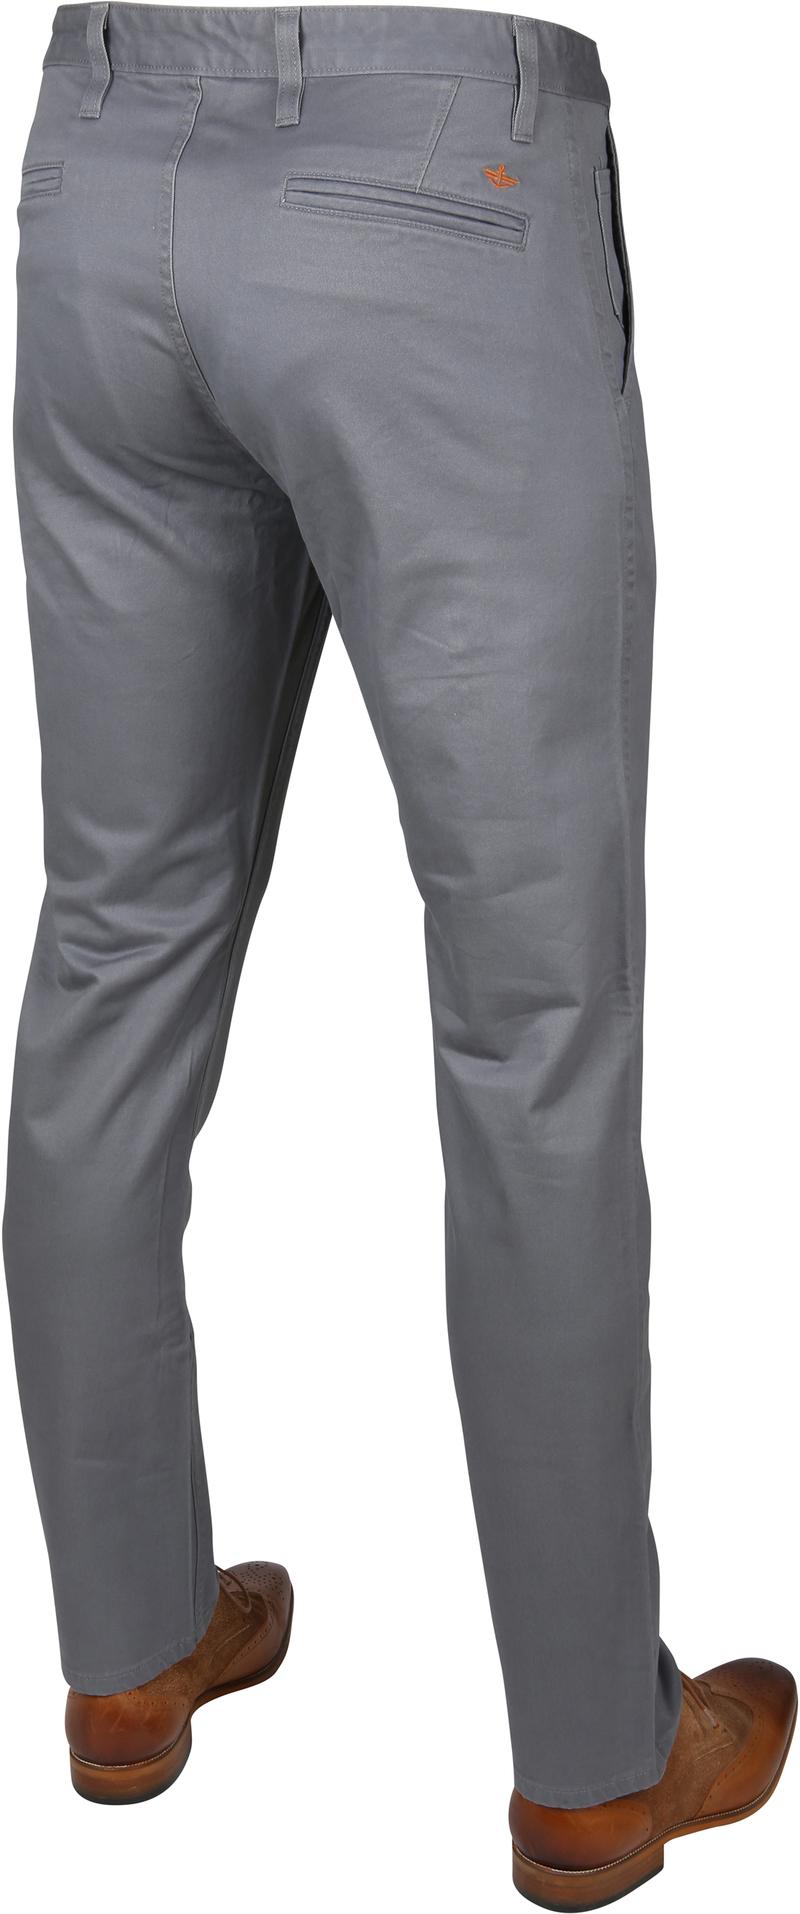 Dockers Alpha Skinny Grijs - Grijs maat W 28 - L 32